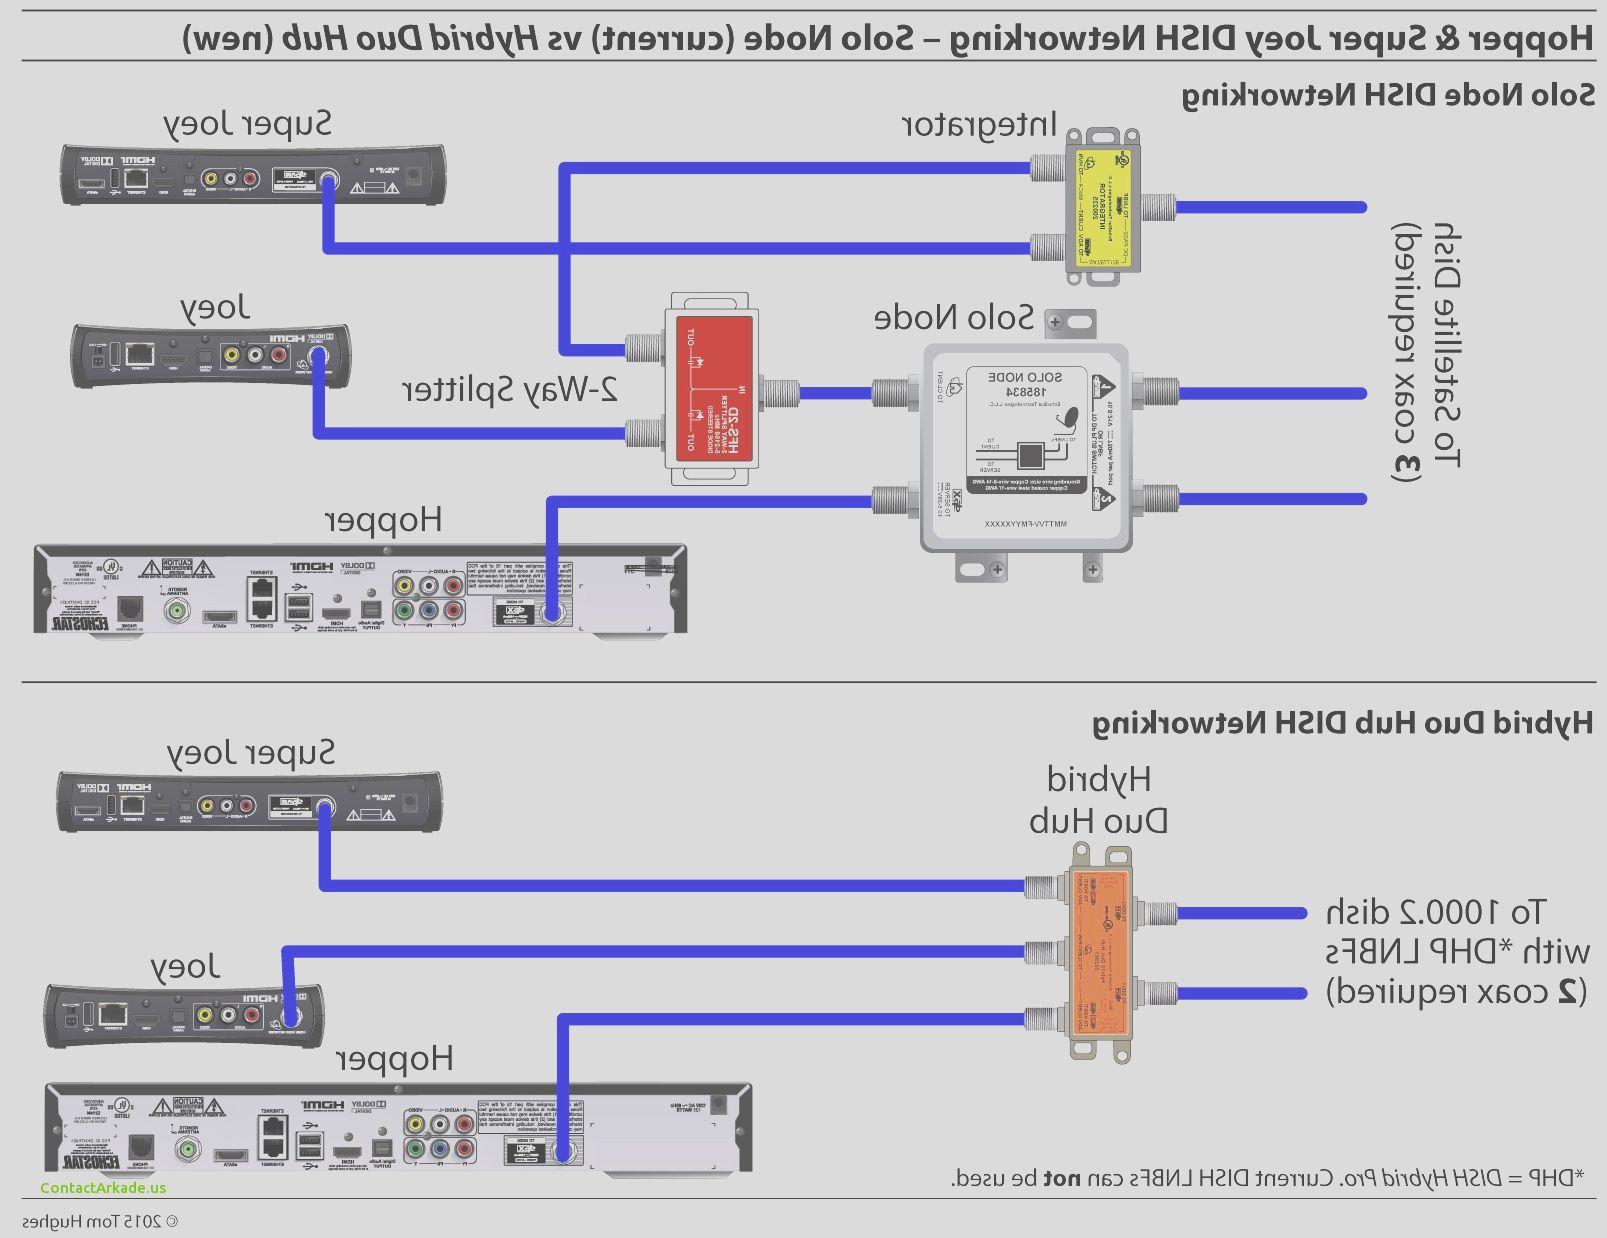 dish hopper joey wiring diagram Download-Dish Network Wiring Diagram Fresh Image Super Joey Wiring Diagram Hopper Dish Integrator to 14-e